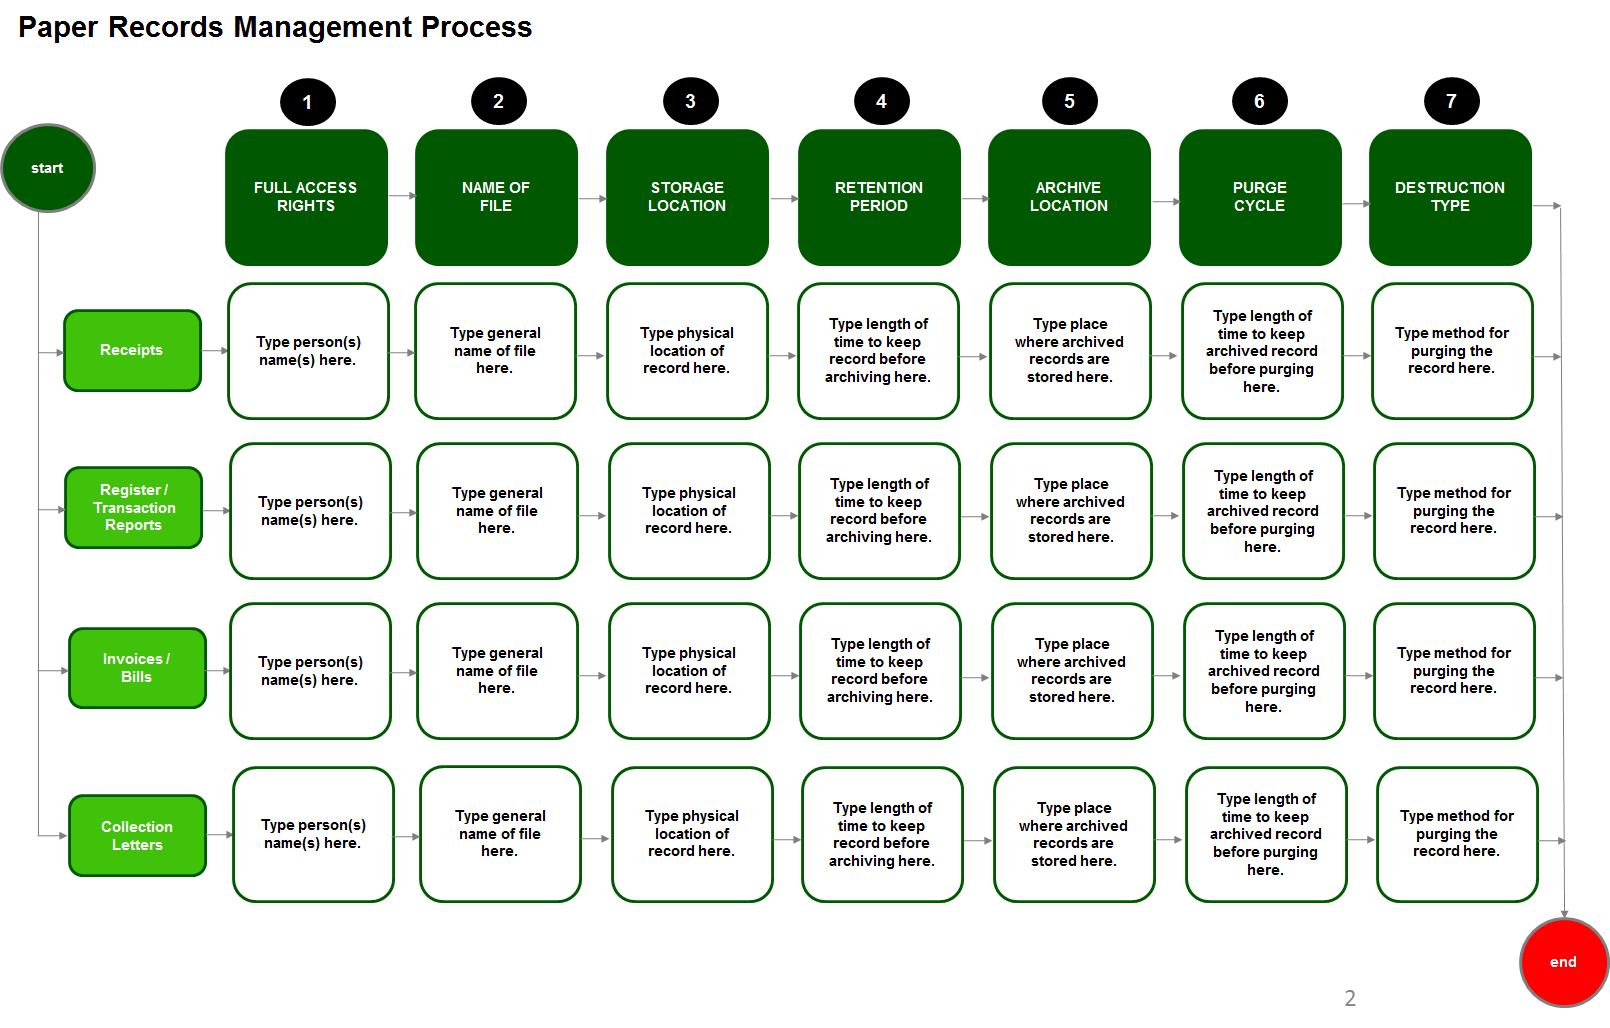 Paper Records Management Process Records Management Big Data Analytics Management